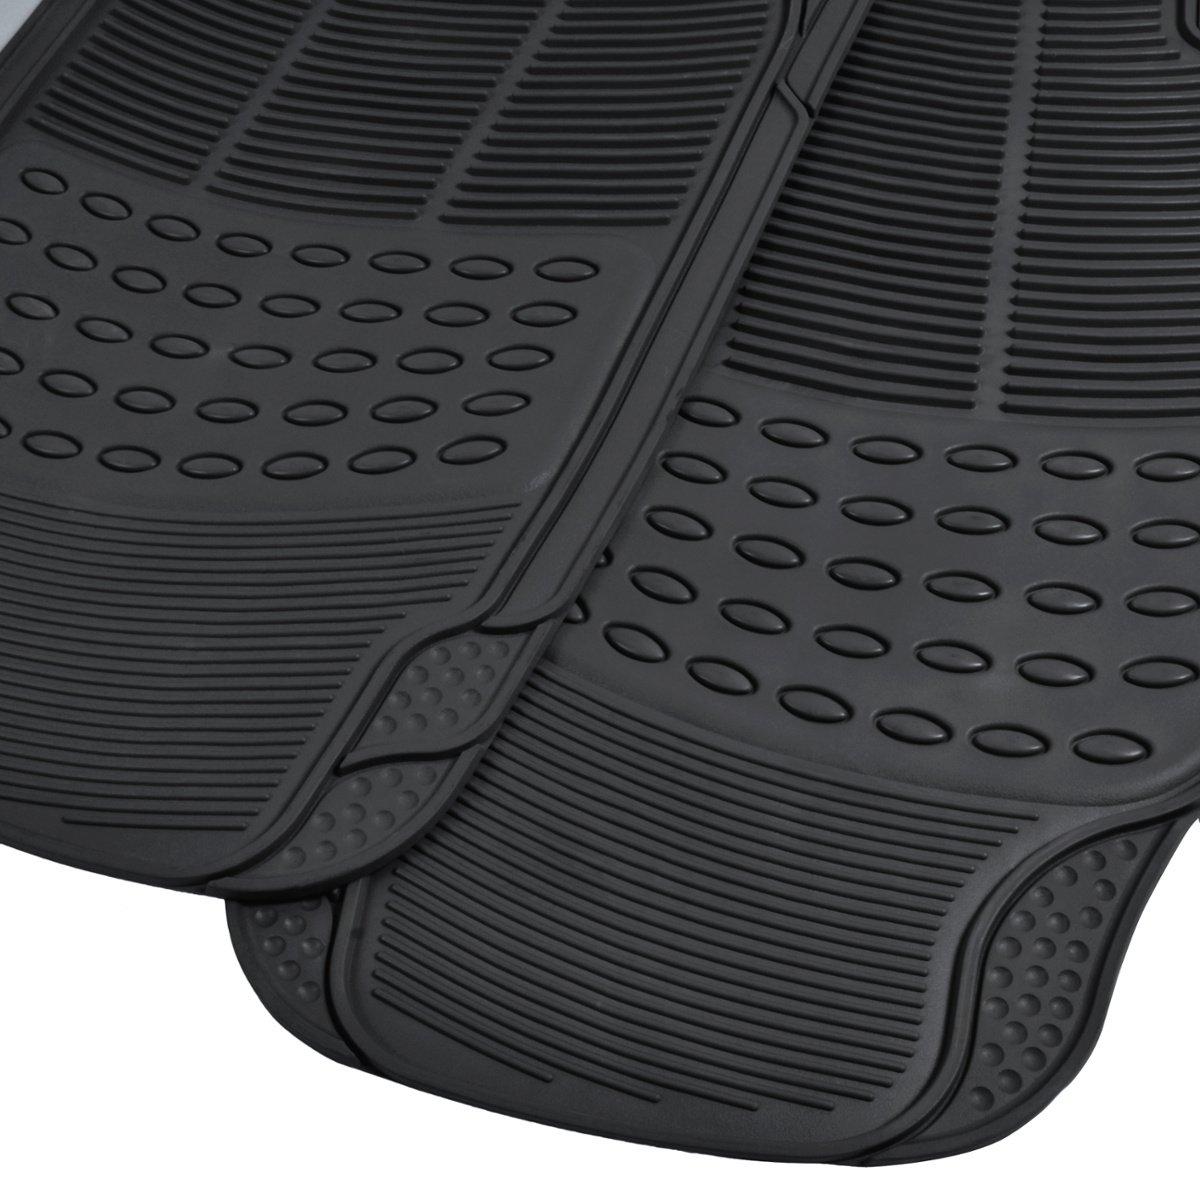 Rubber mats car - Amazon Com Bdk Heavy Duty Rubber Floor Mats Universal For Car Truck Suv Full 3pc Set In Black Automotive